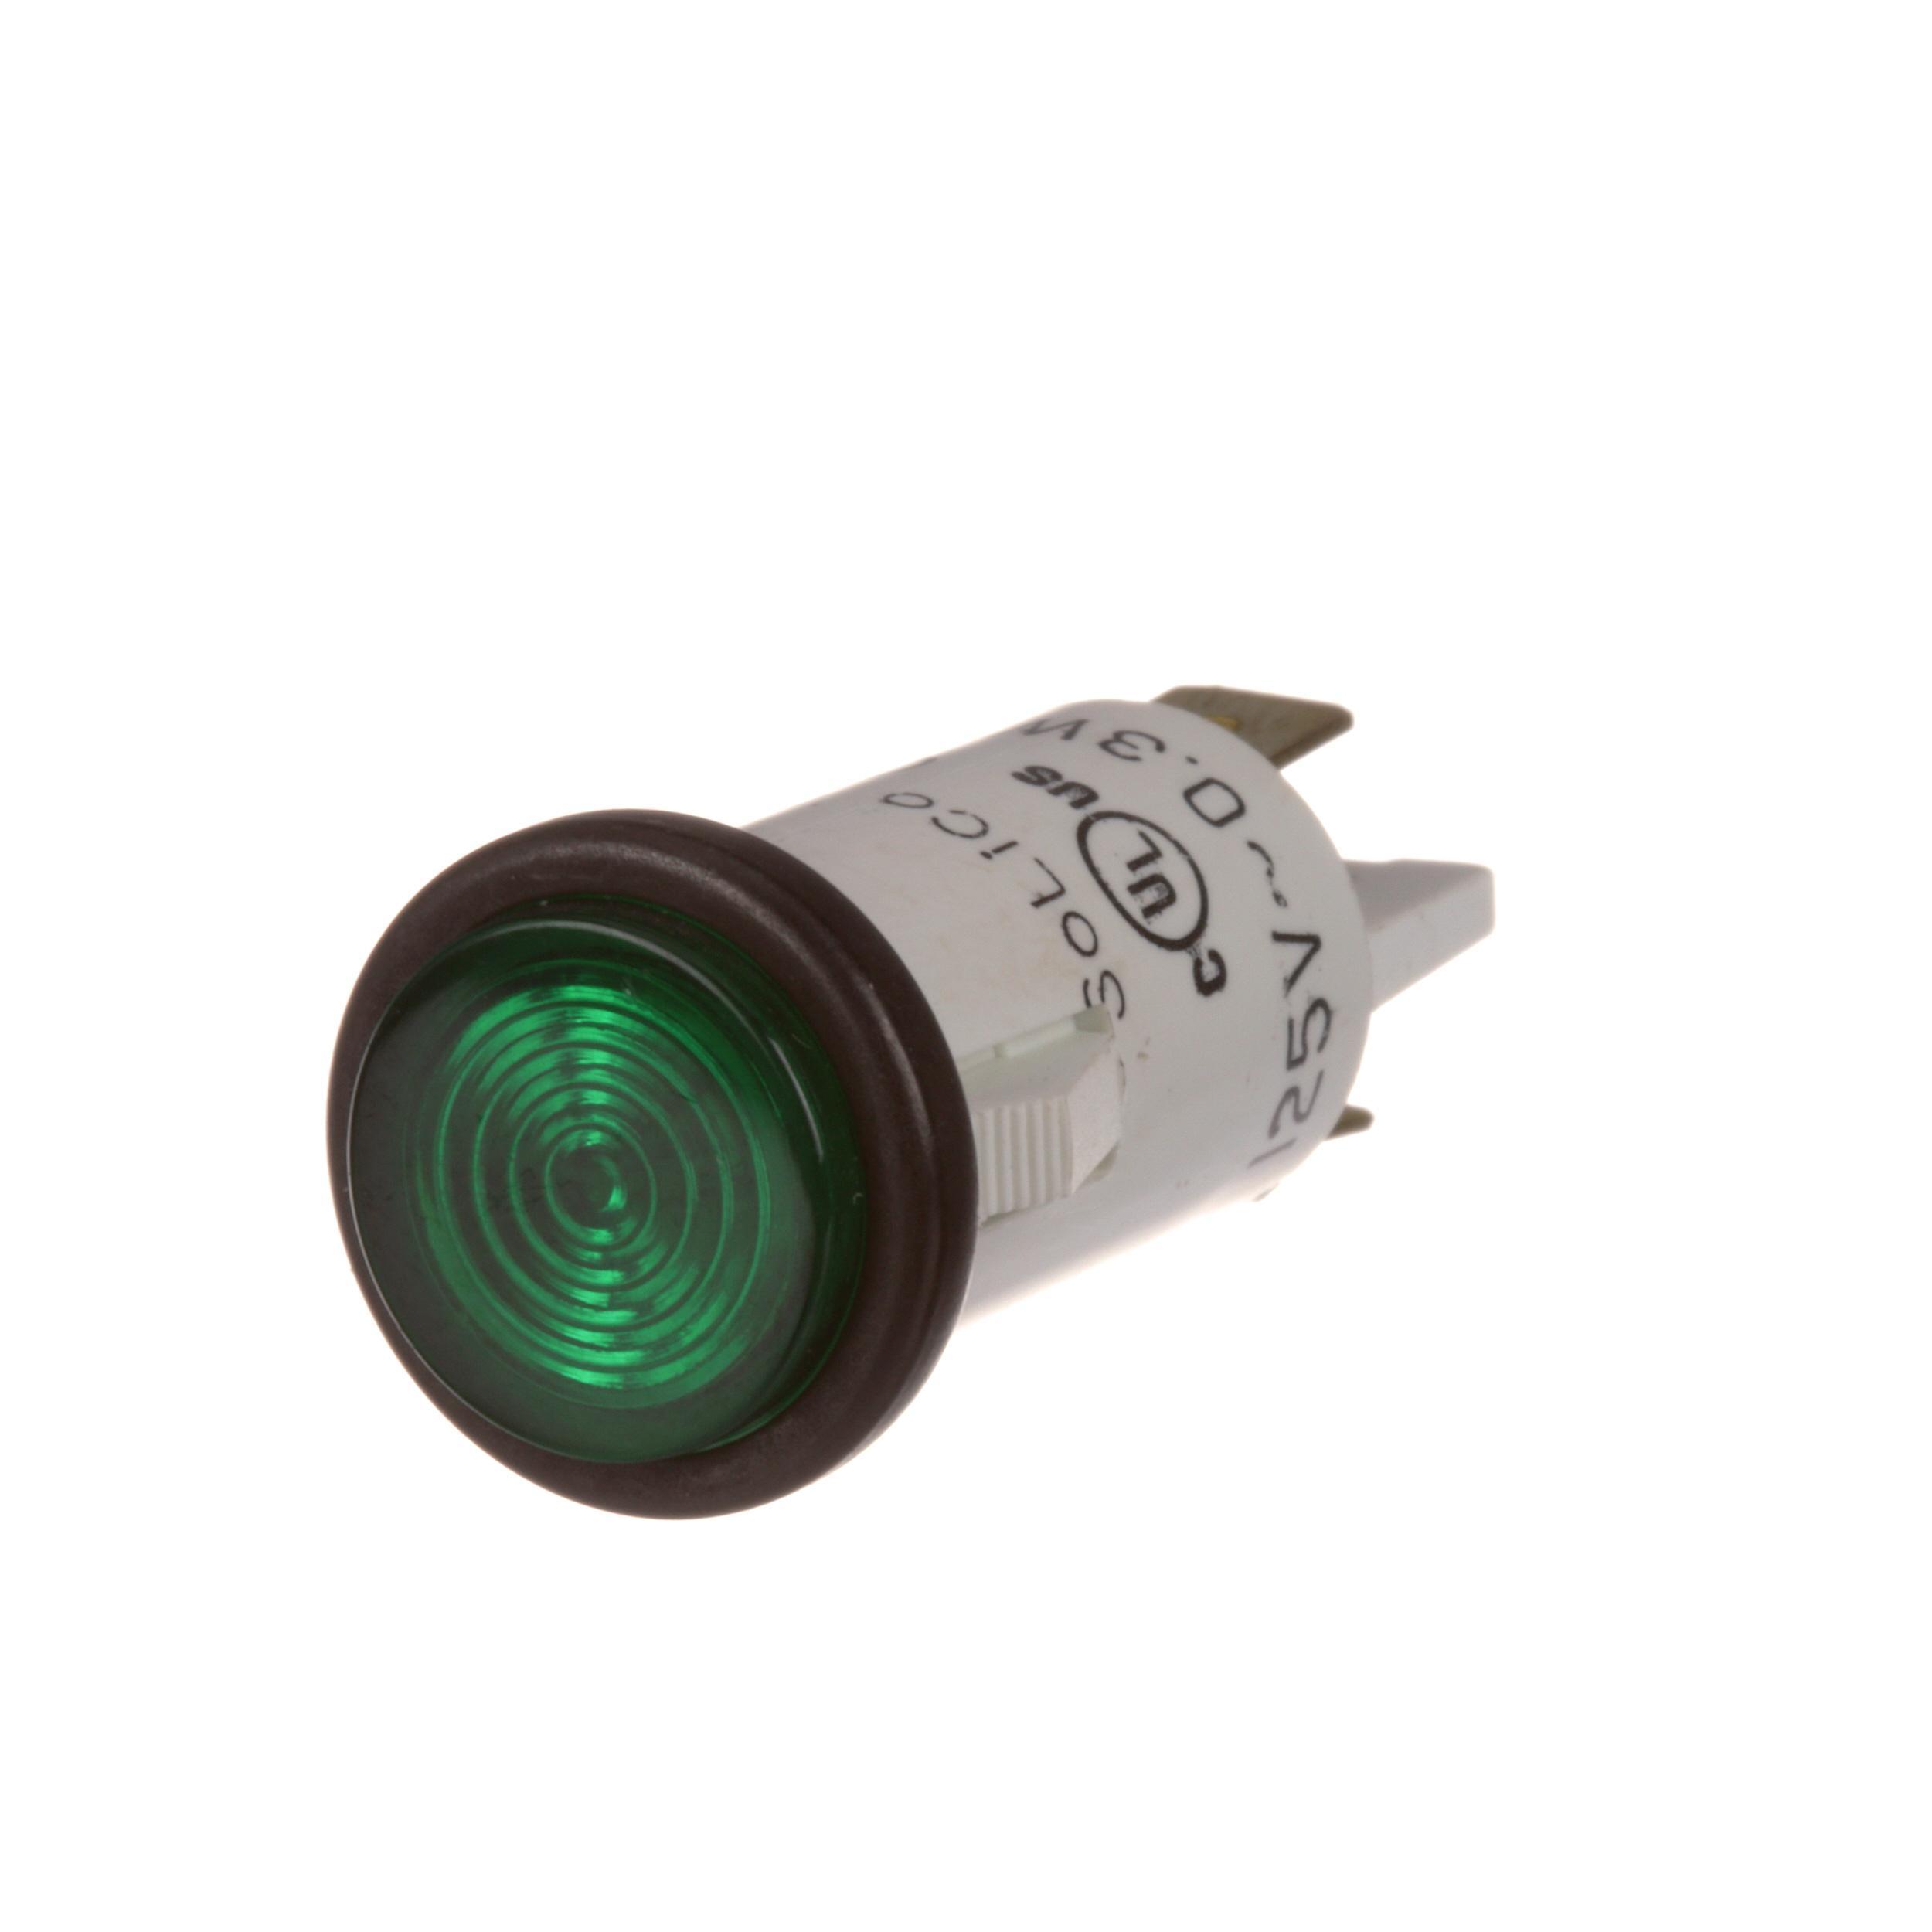 HATCO GREEN LIGHT